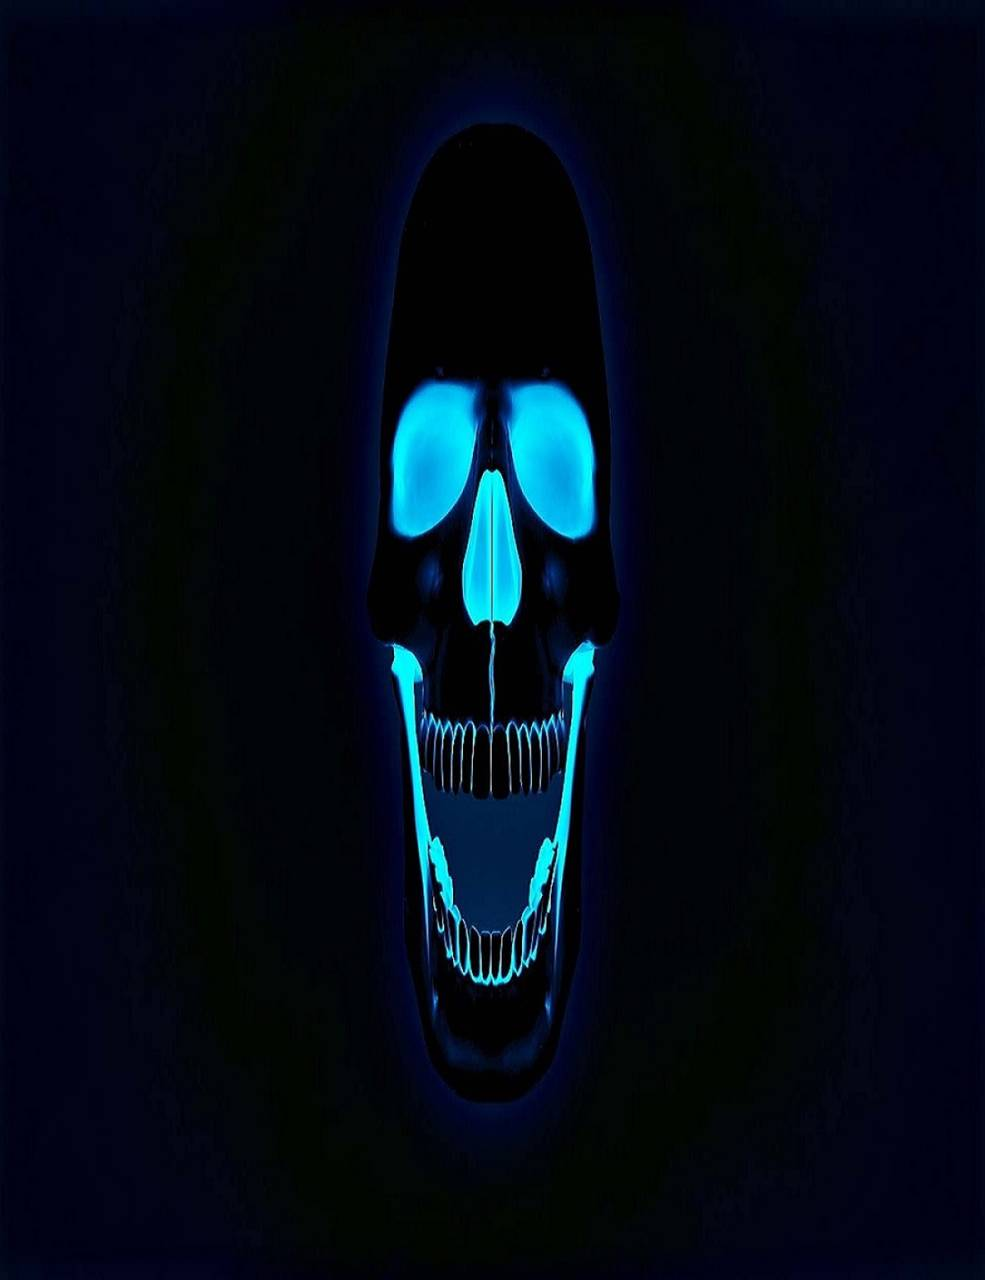 blue neon skull